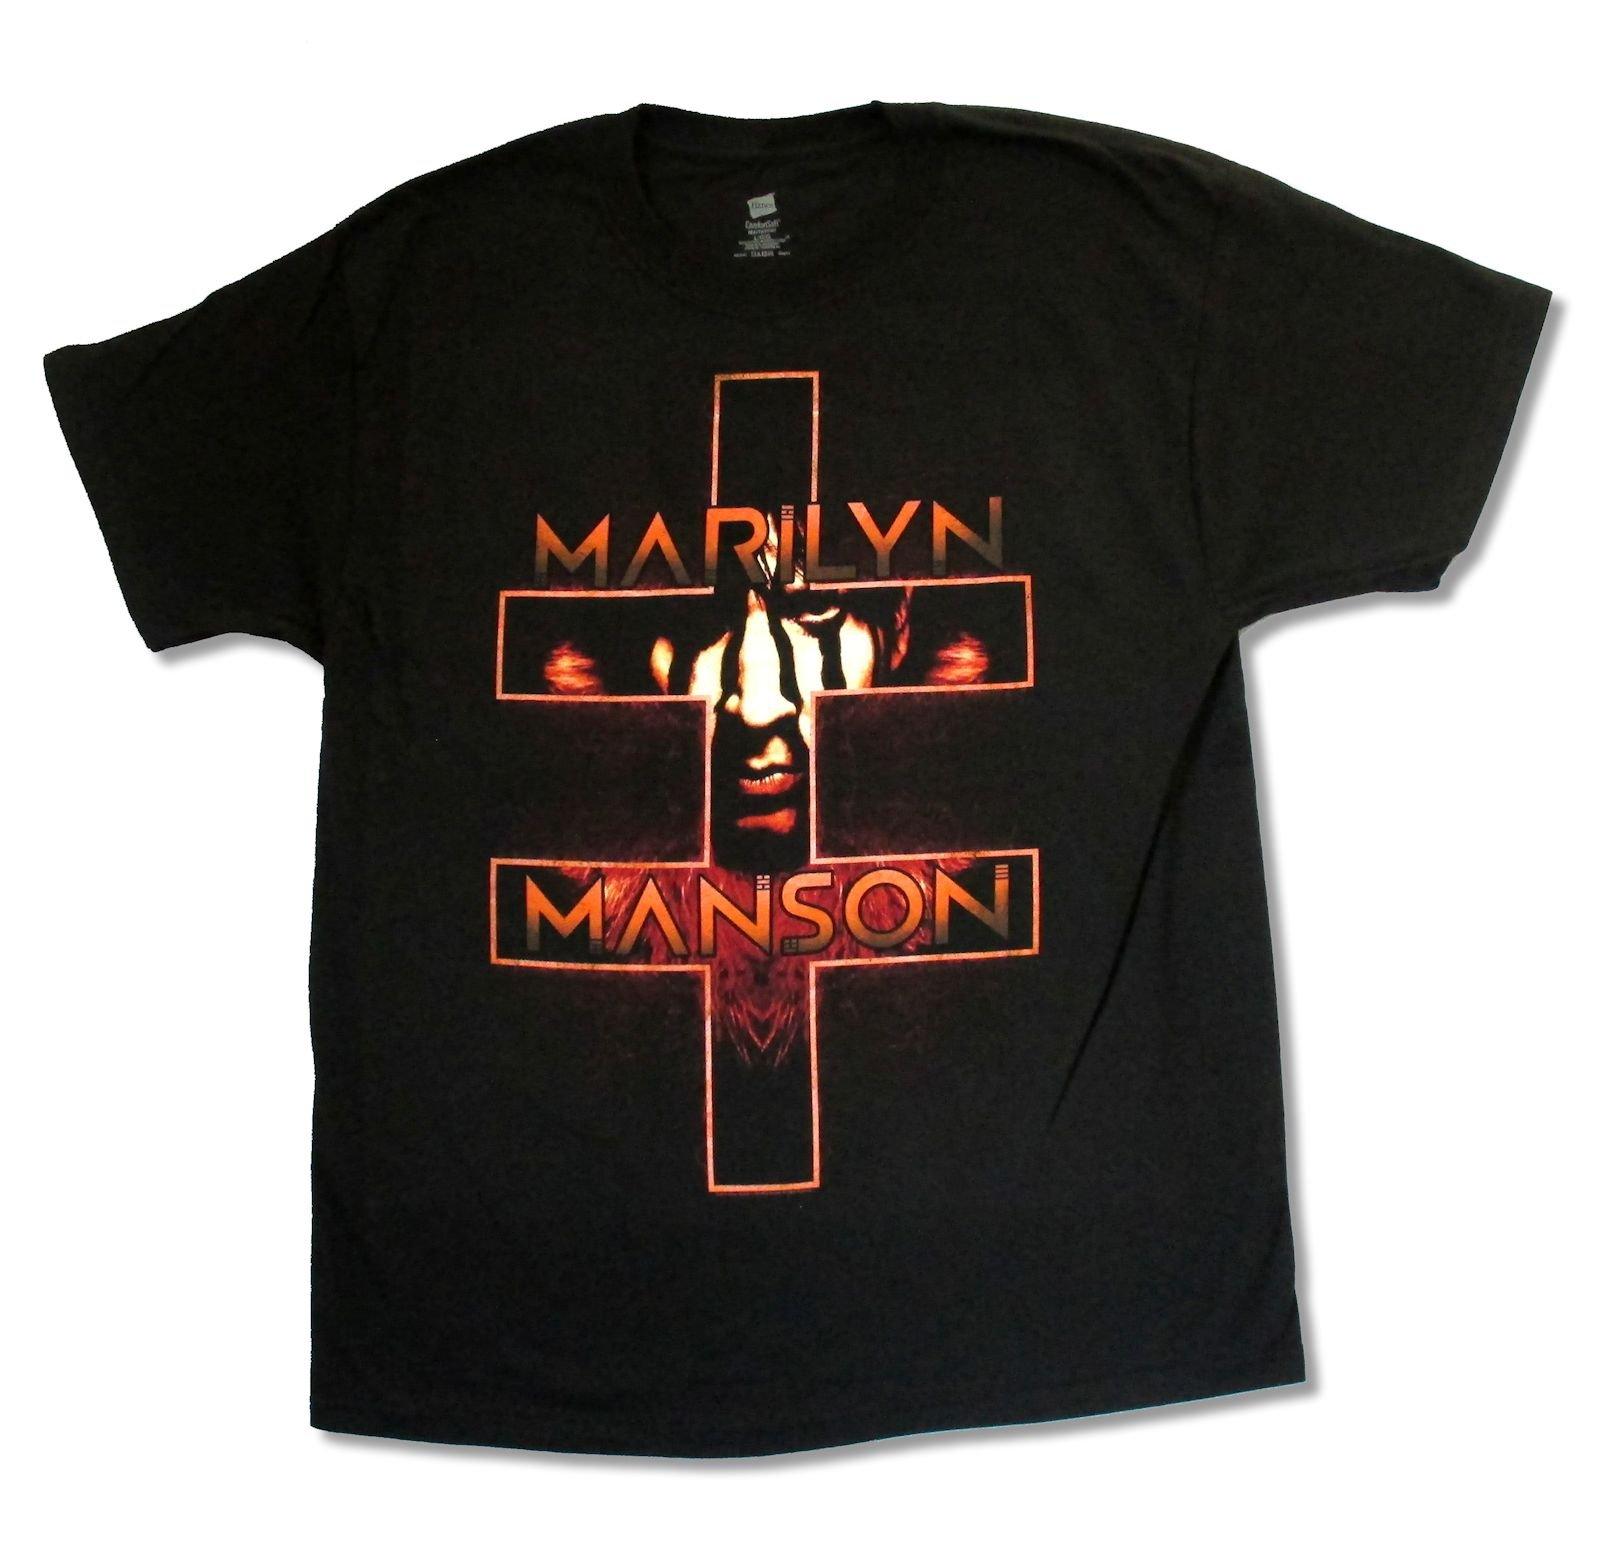 Adult Marilyn Manson Double Cross Tour T Shirt 3603